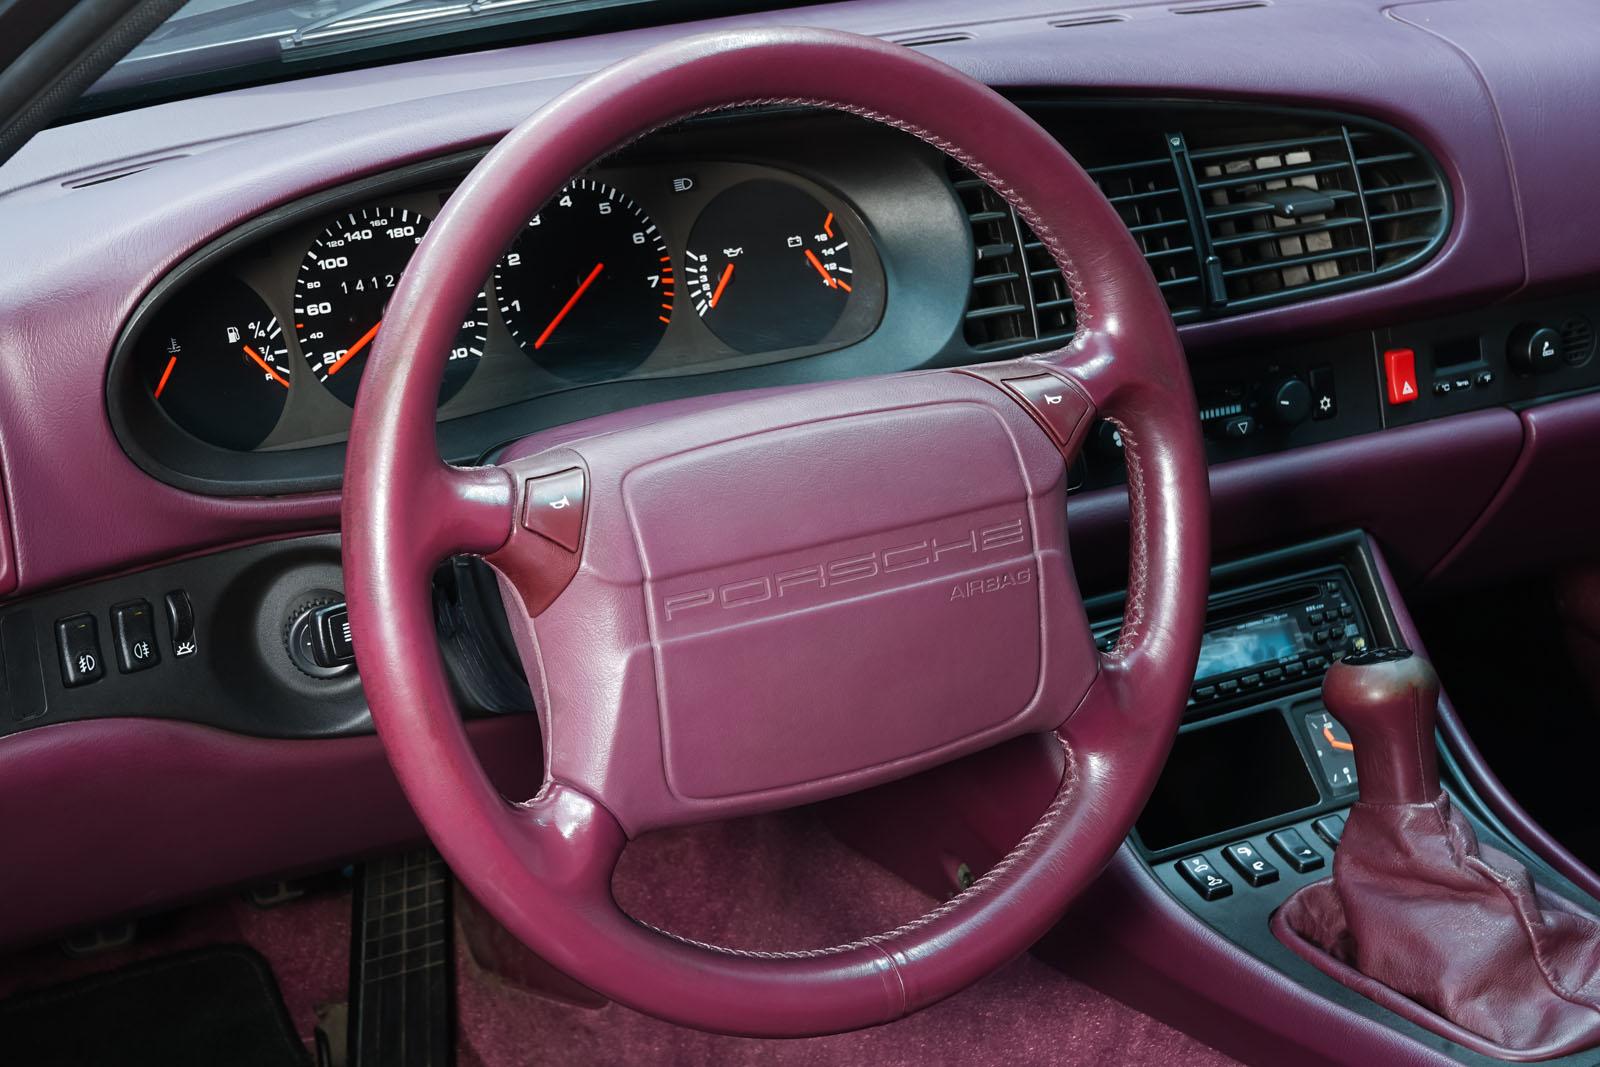 Porsche_986_Targa_Grau_Pink_POR-1092_9_w